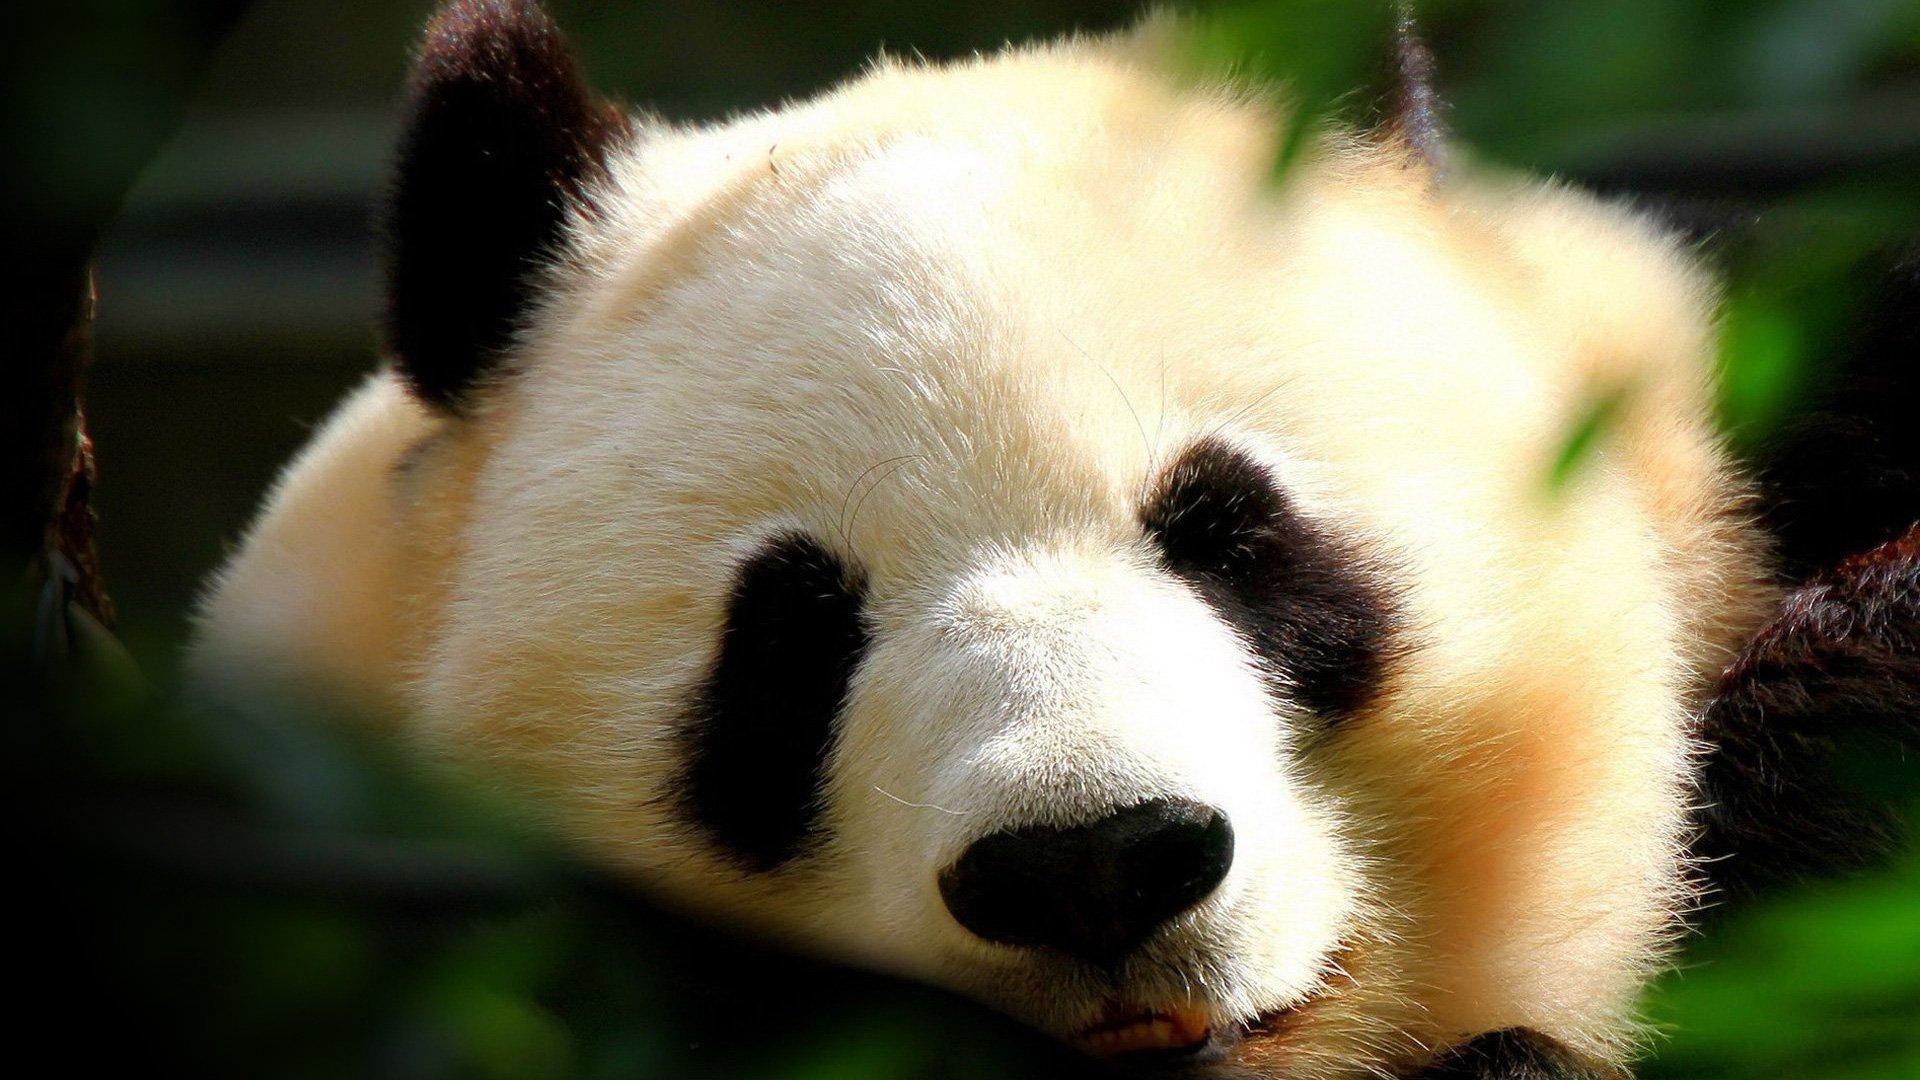 wallpaper panda Full HD 1080p wallpaper adorablejpg 1920x1080